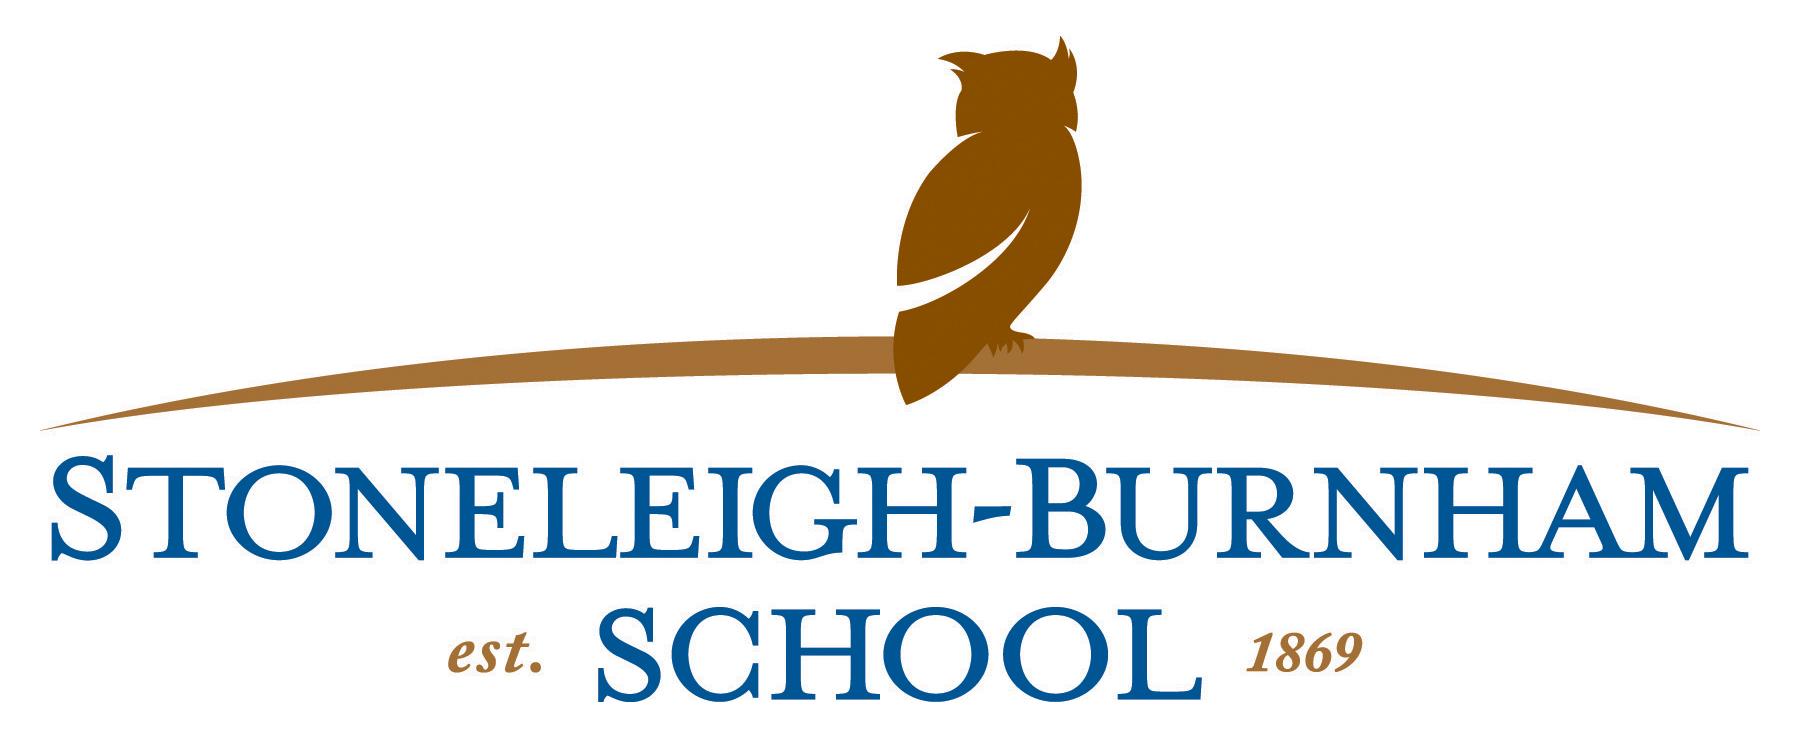 Stoneleigh Burnham School